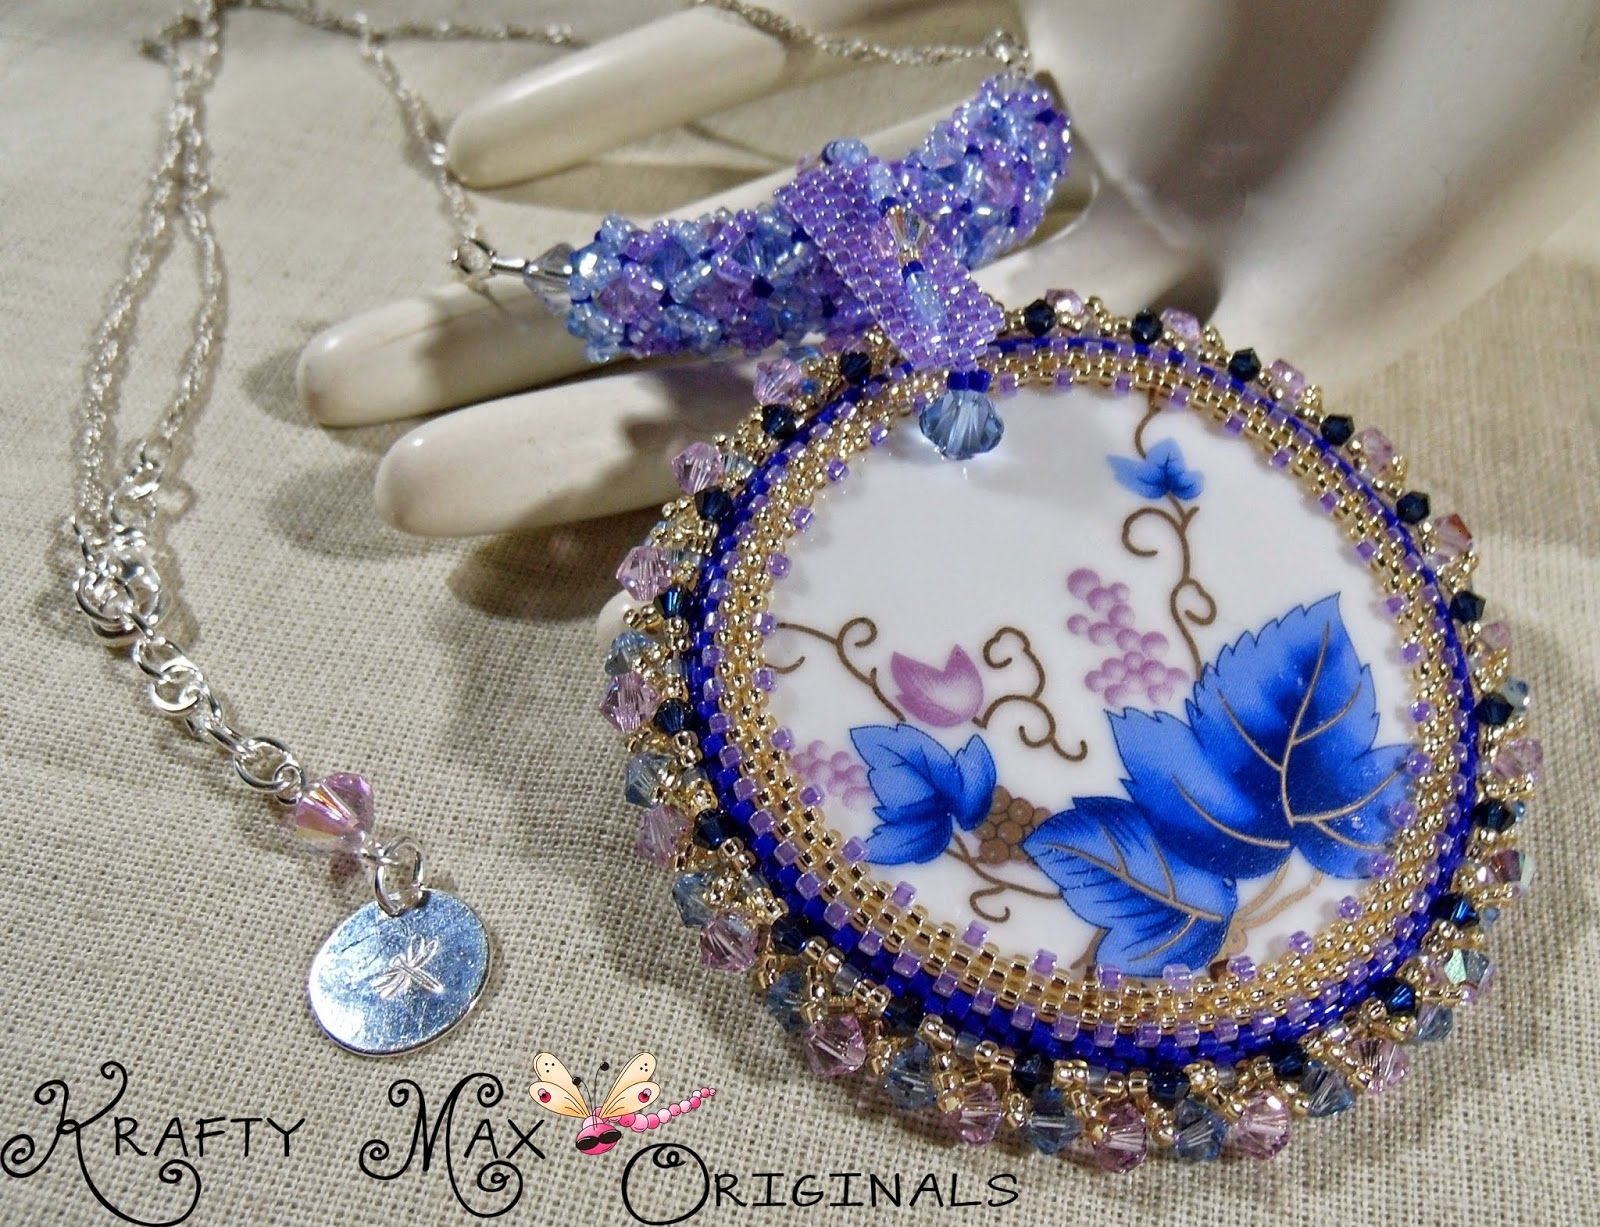 http://www.artfire.com/ext/shop/product_view/KraftyMax/9750132/ms_marrianne_blue_bell_-_handmade_beadwoven_swarovski_crystal_set/handmade/jewelry/necklaces/beadwoven